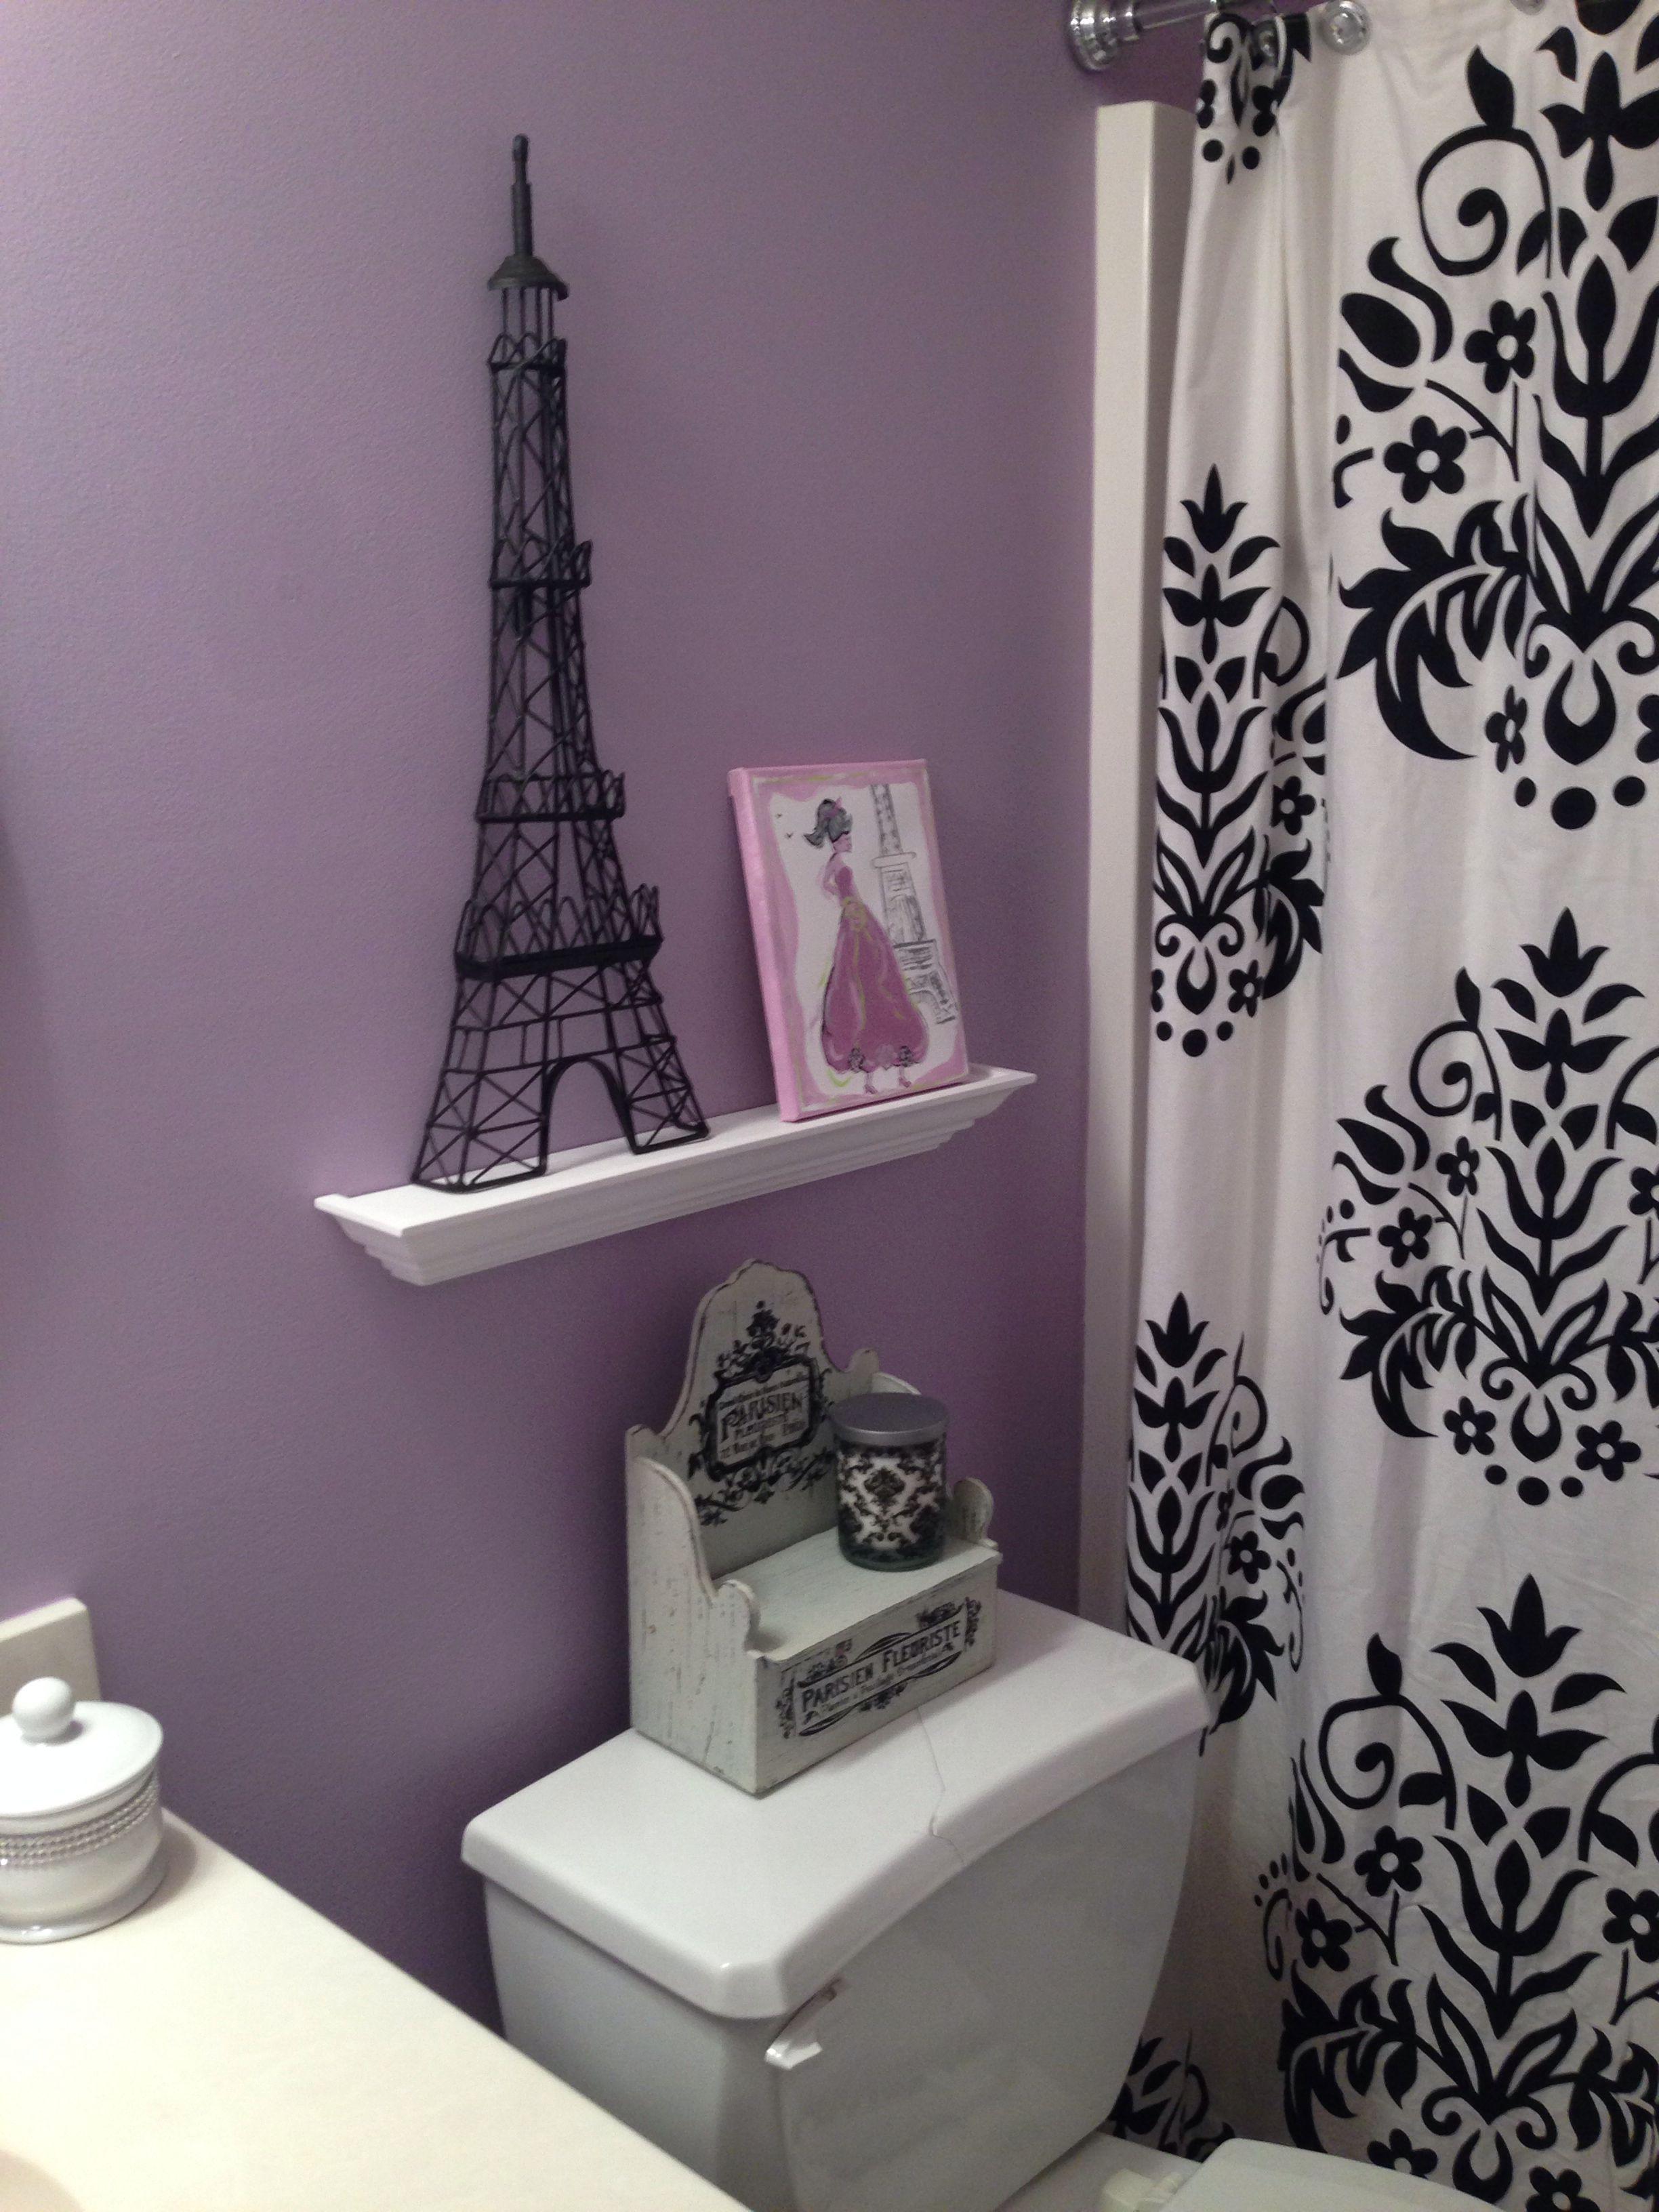 Pin By Terri Harr On Paris Paris Bathroom Decor Paris Theme Bathroom Paris Bathroom